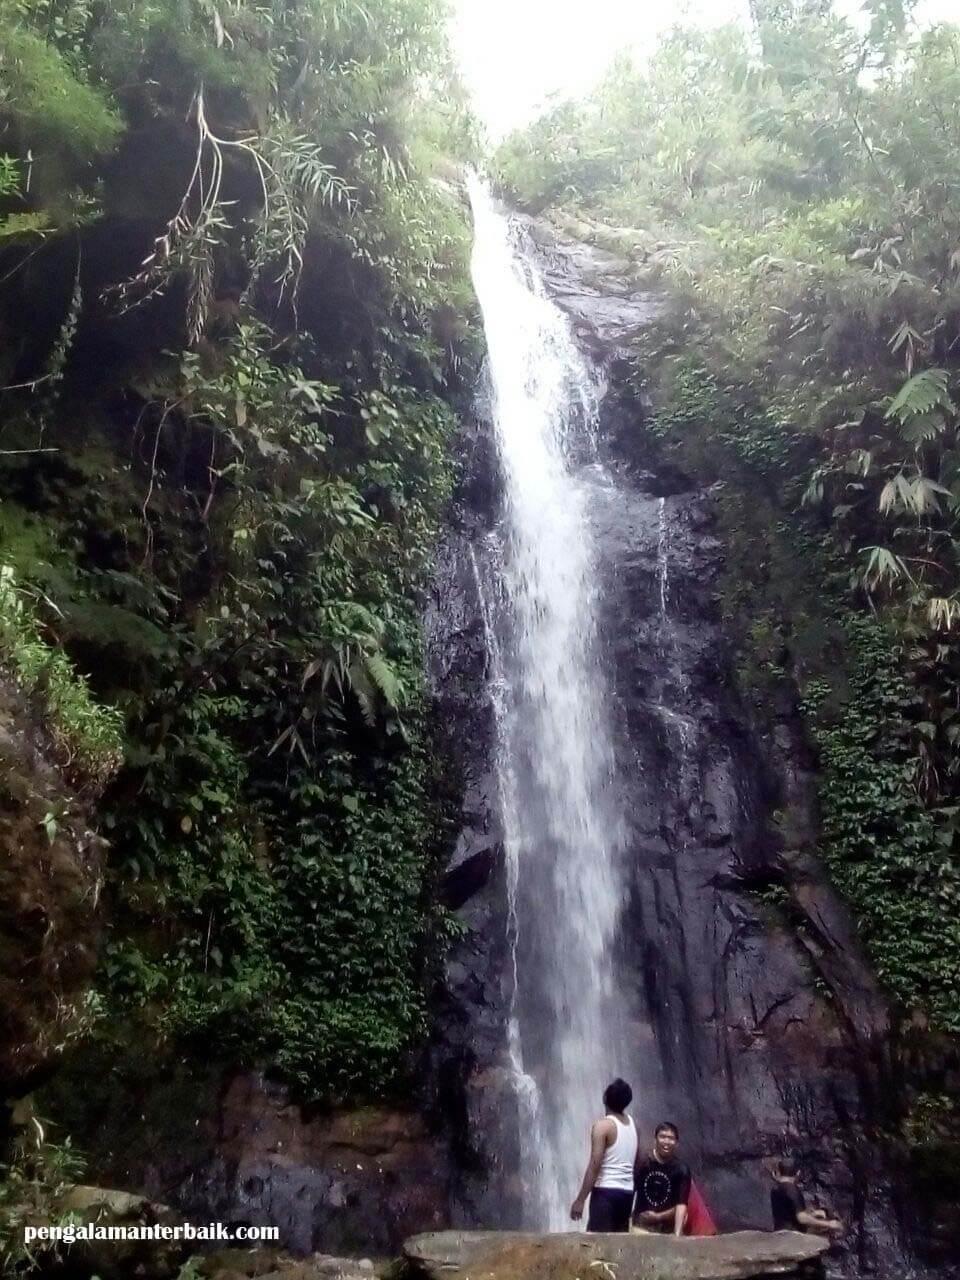 Harga Tiket wisata alam Curug mandala, Subang  Pengalaman Terbaik